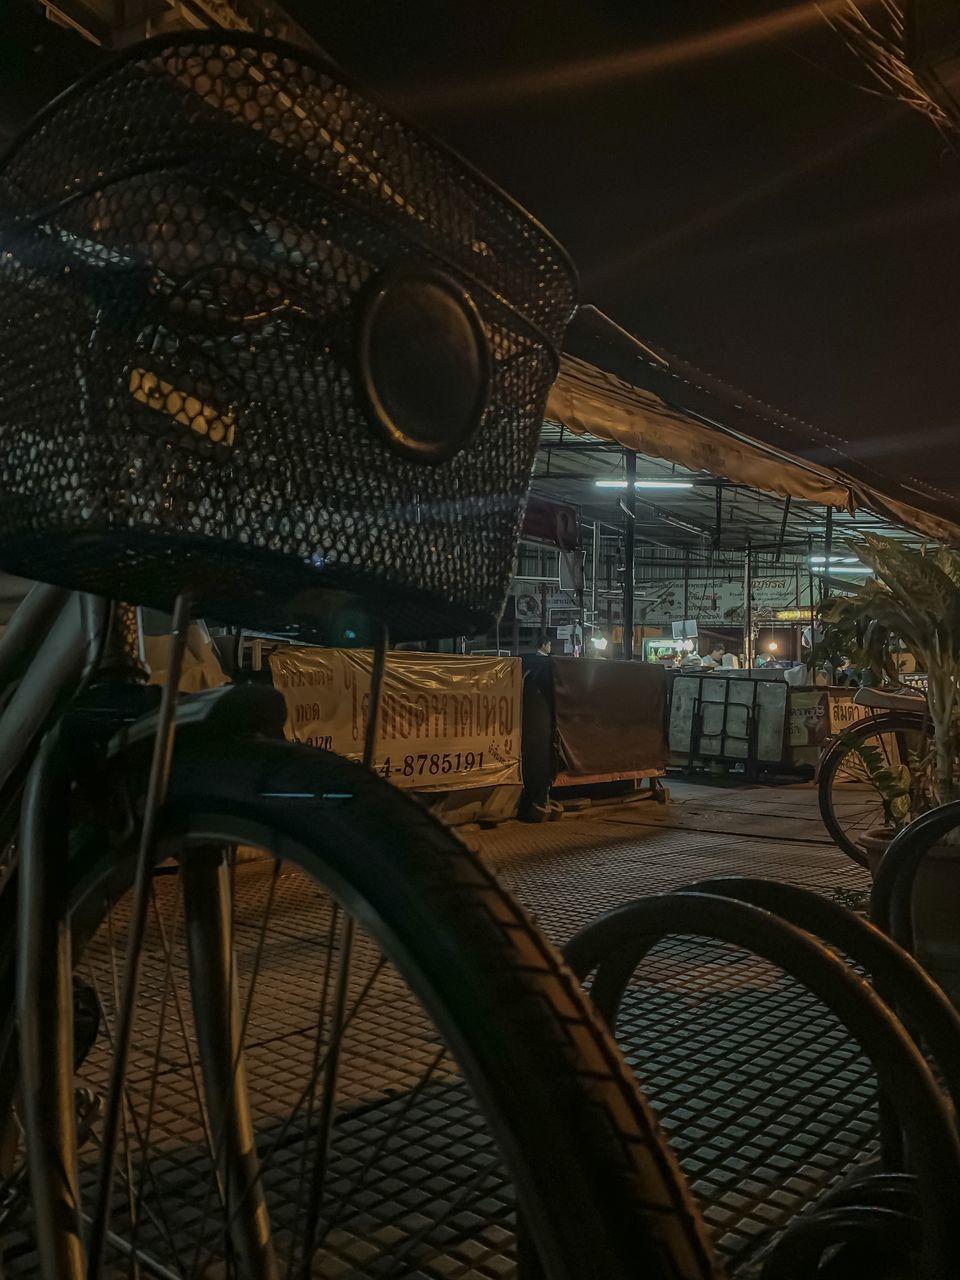 VIEW OF ILLUMINATED BICYCLE AT NIGHT